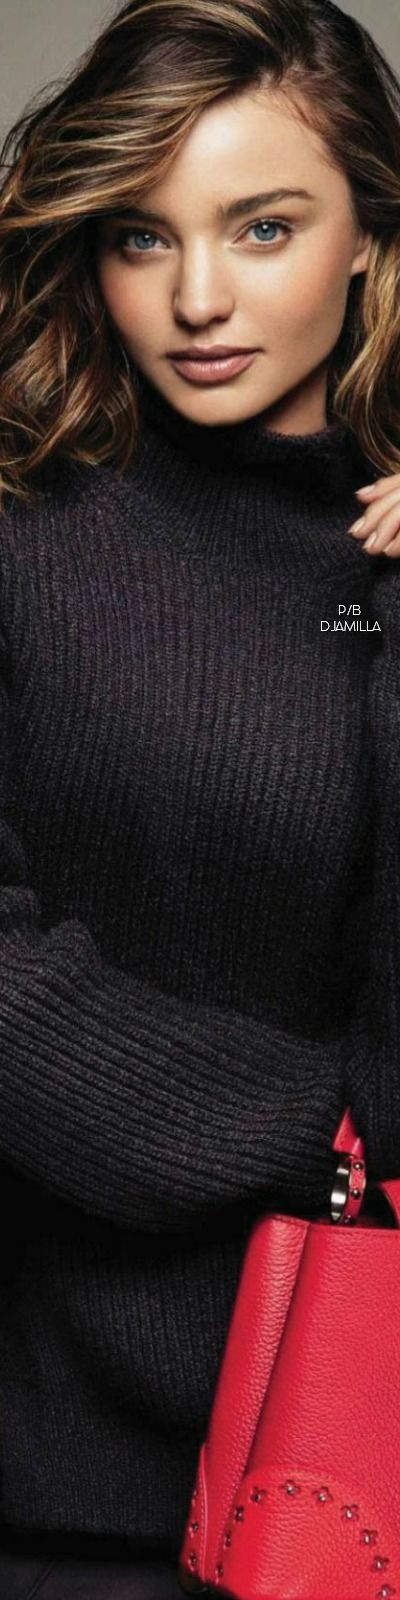 Miranda Kerr – Hola! Fashion September 2017 Issue